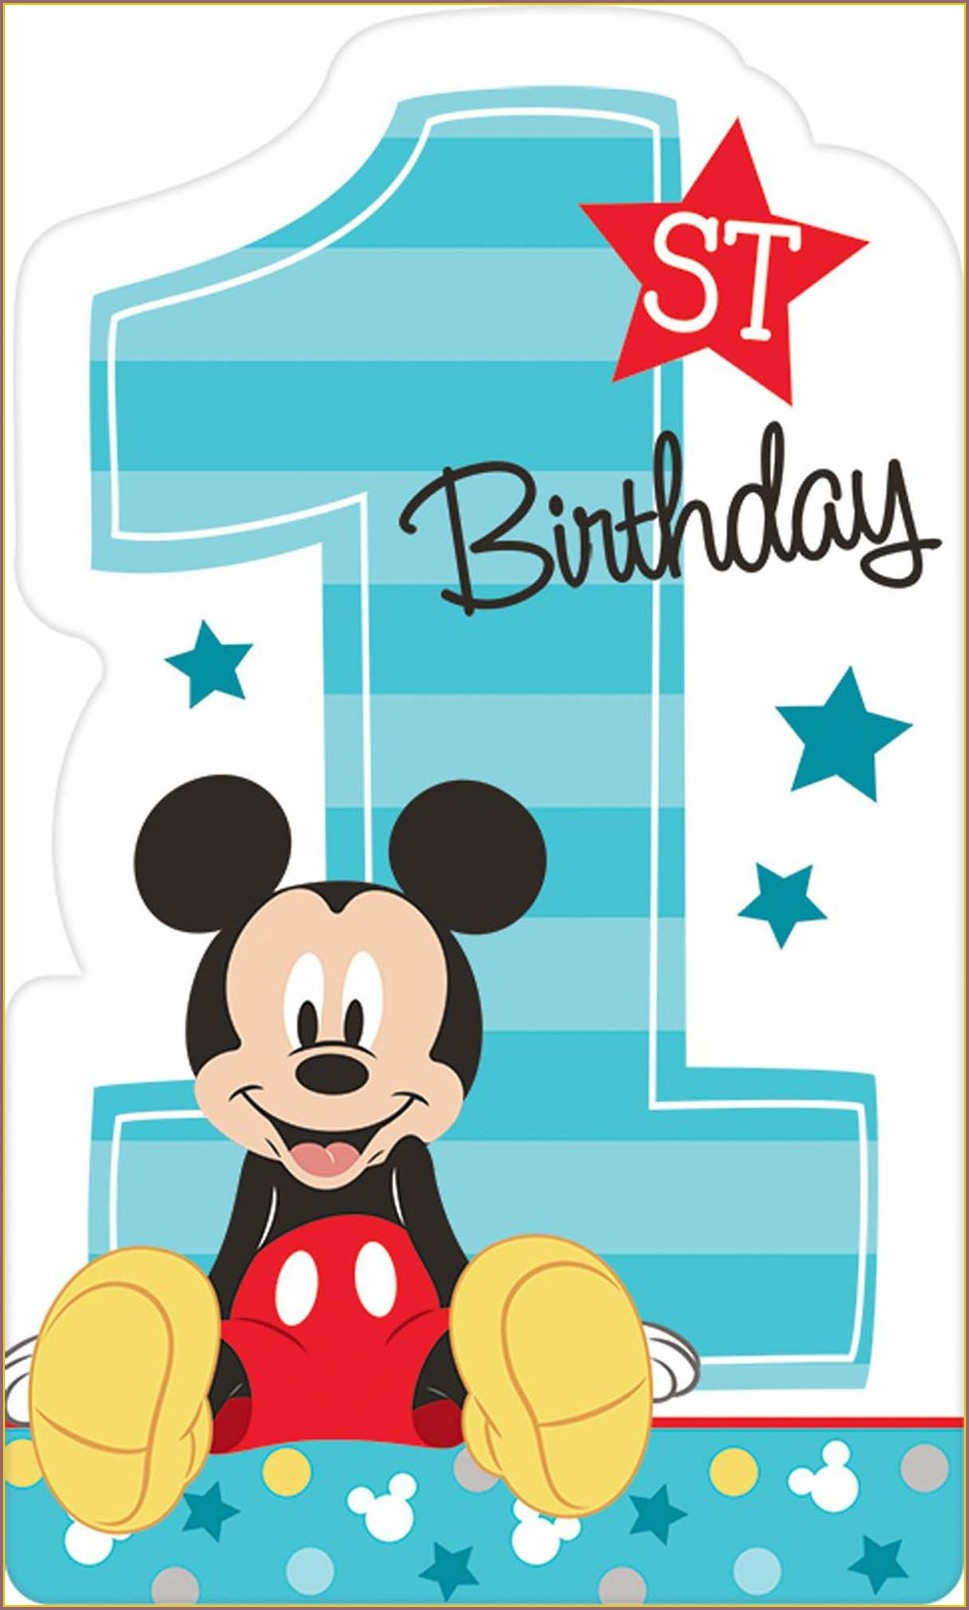 Fun To Be One Birthday Invitations